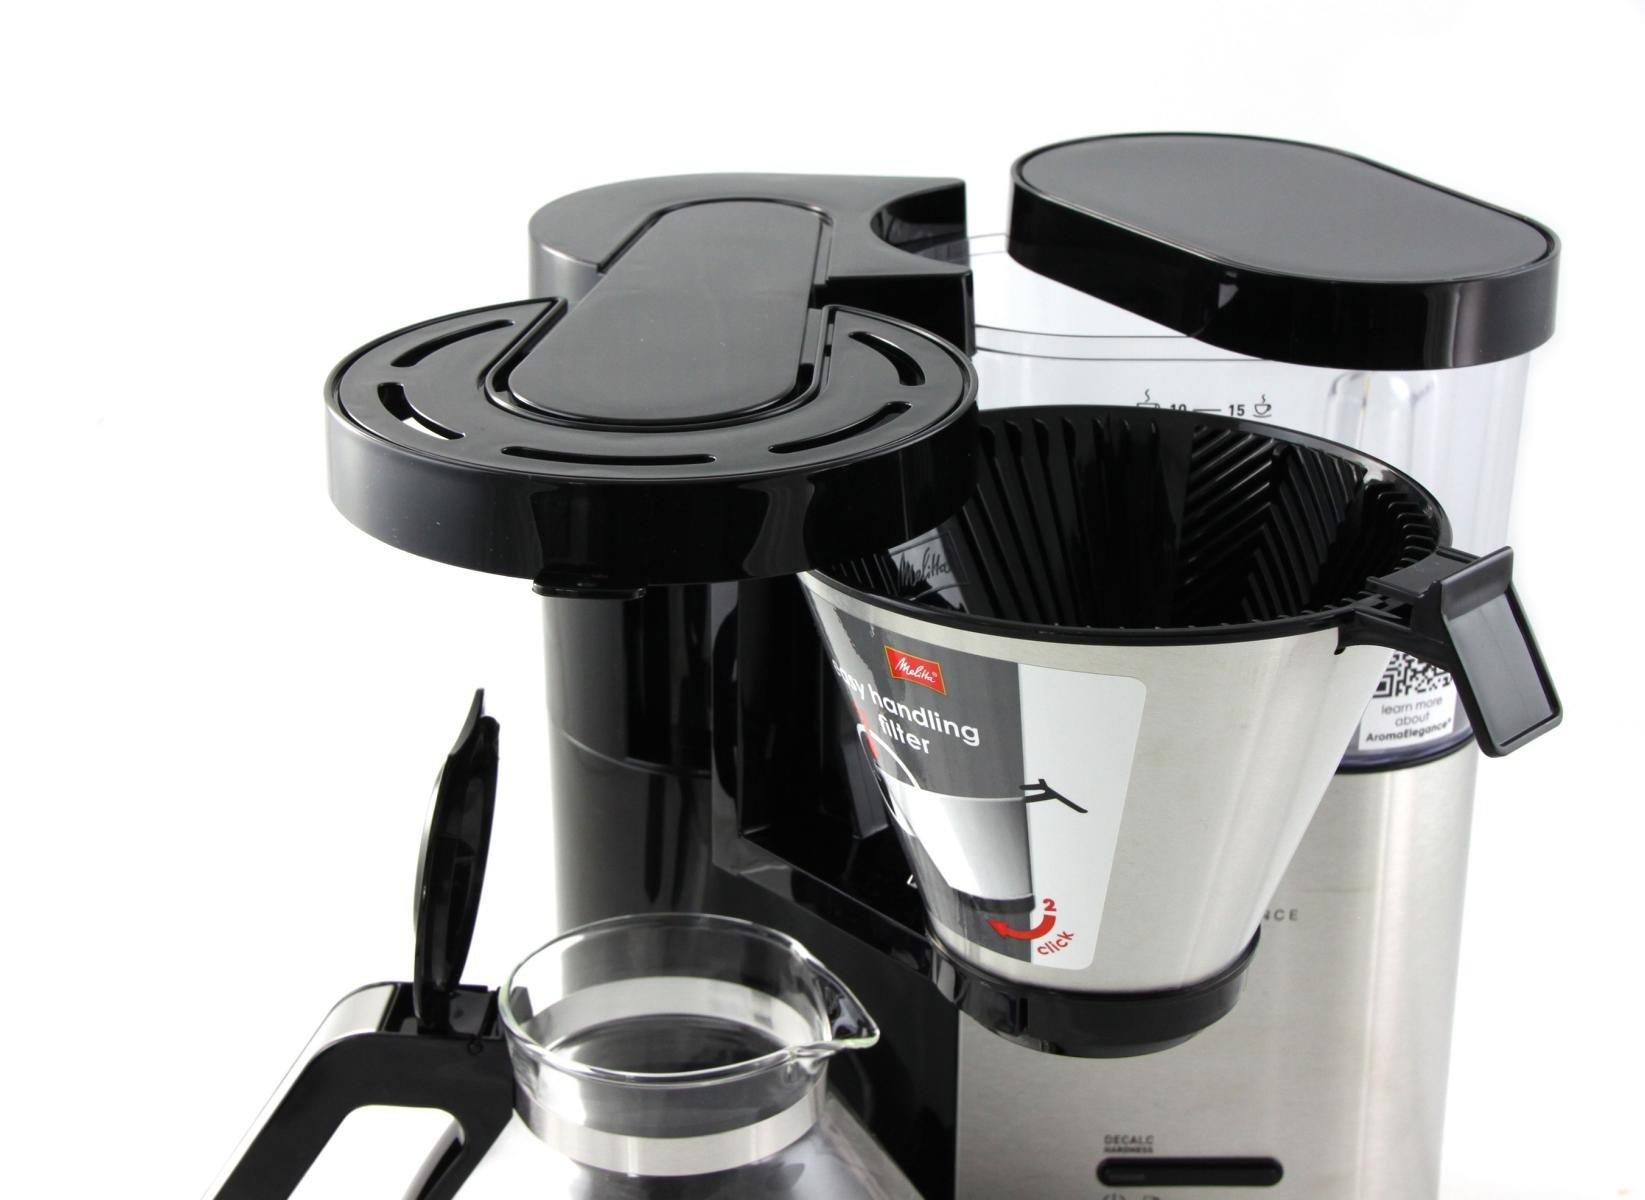 Melitta-Filterkaffeemaschine-mit-Glaskanne-Aroma-Elegance-Aromaschalter